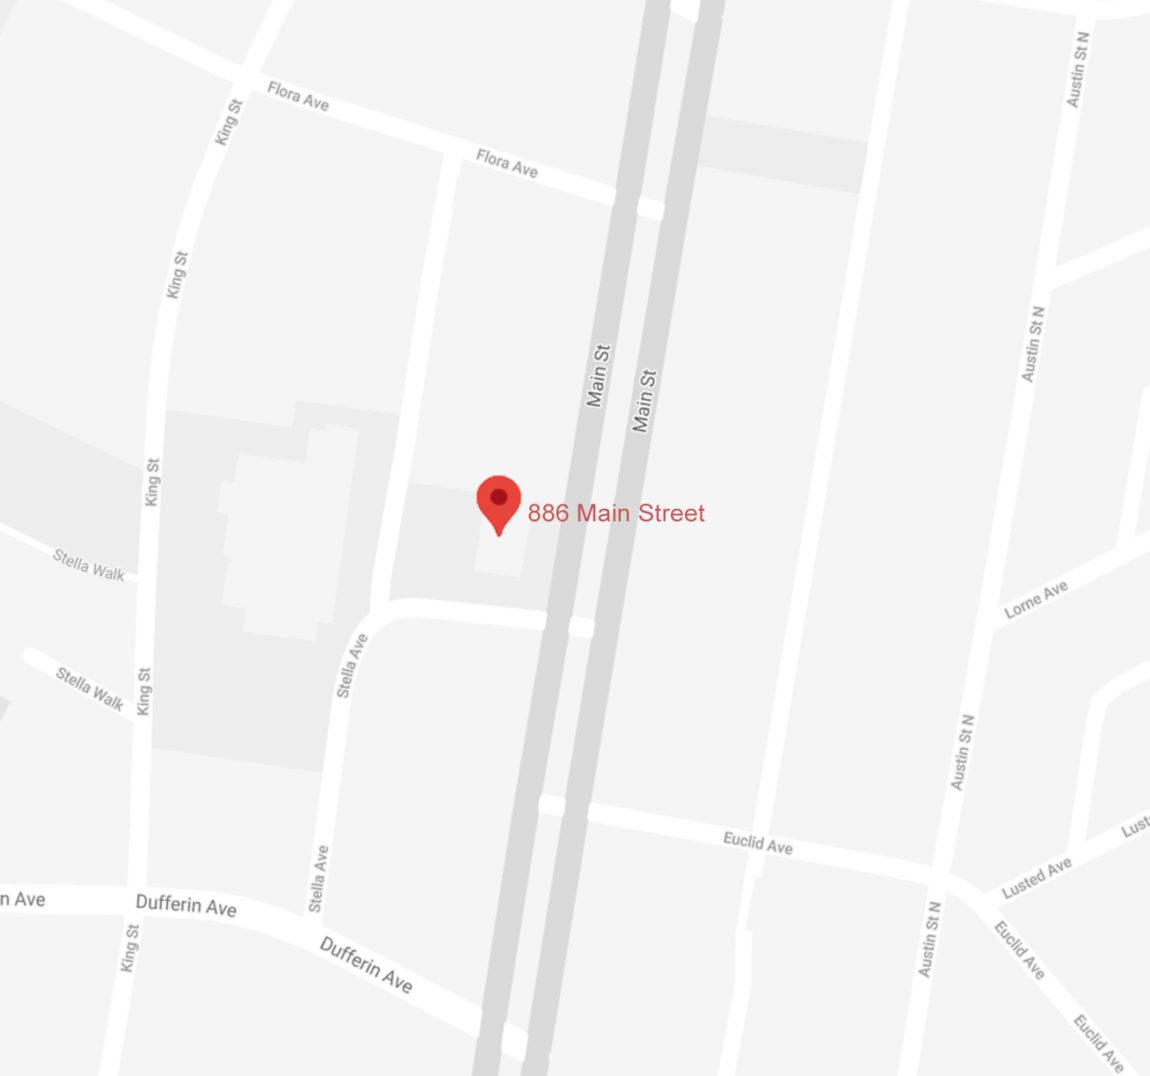 886 Main Street